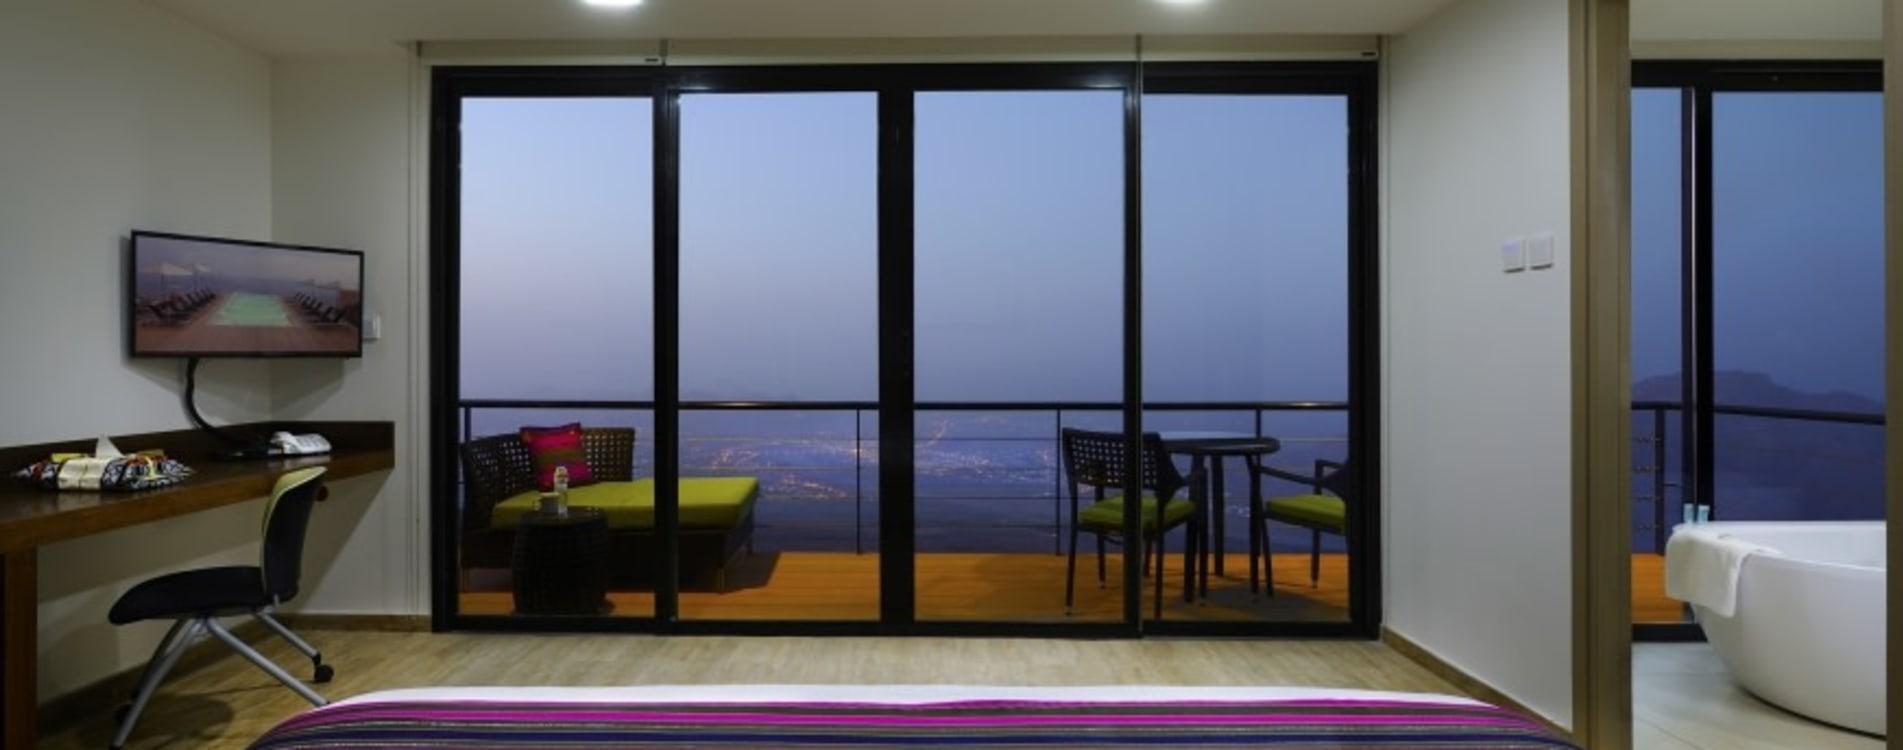 The-View-Oman-Hotel-Balkon-Terrasse.jpg